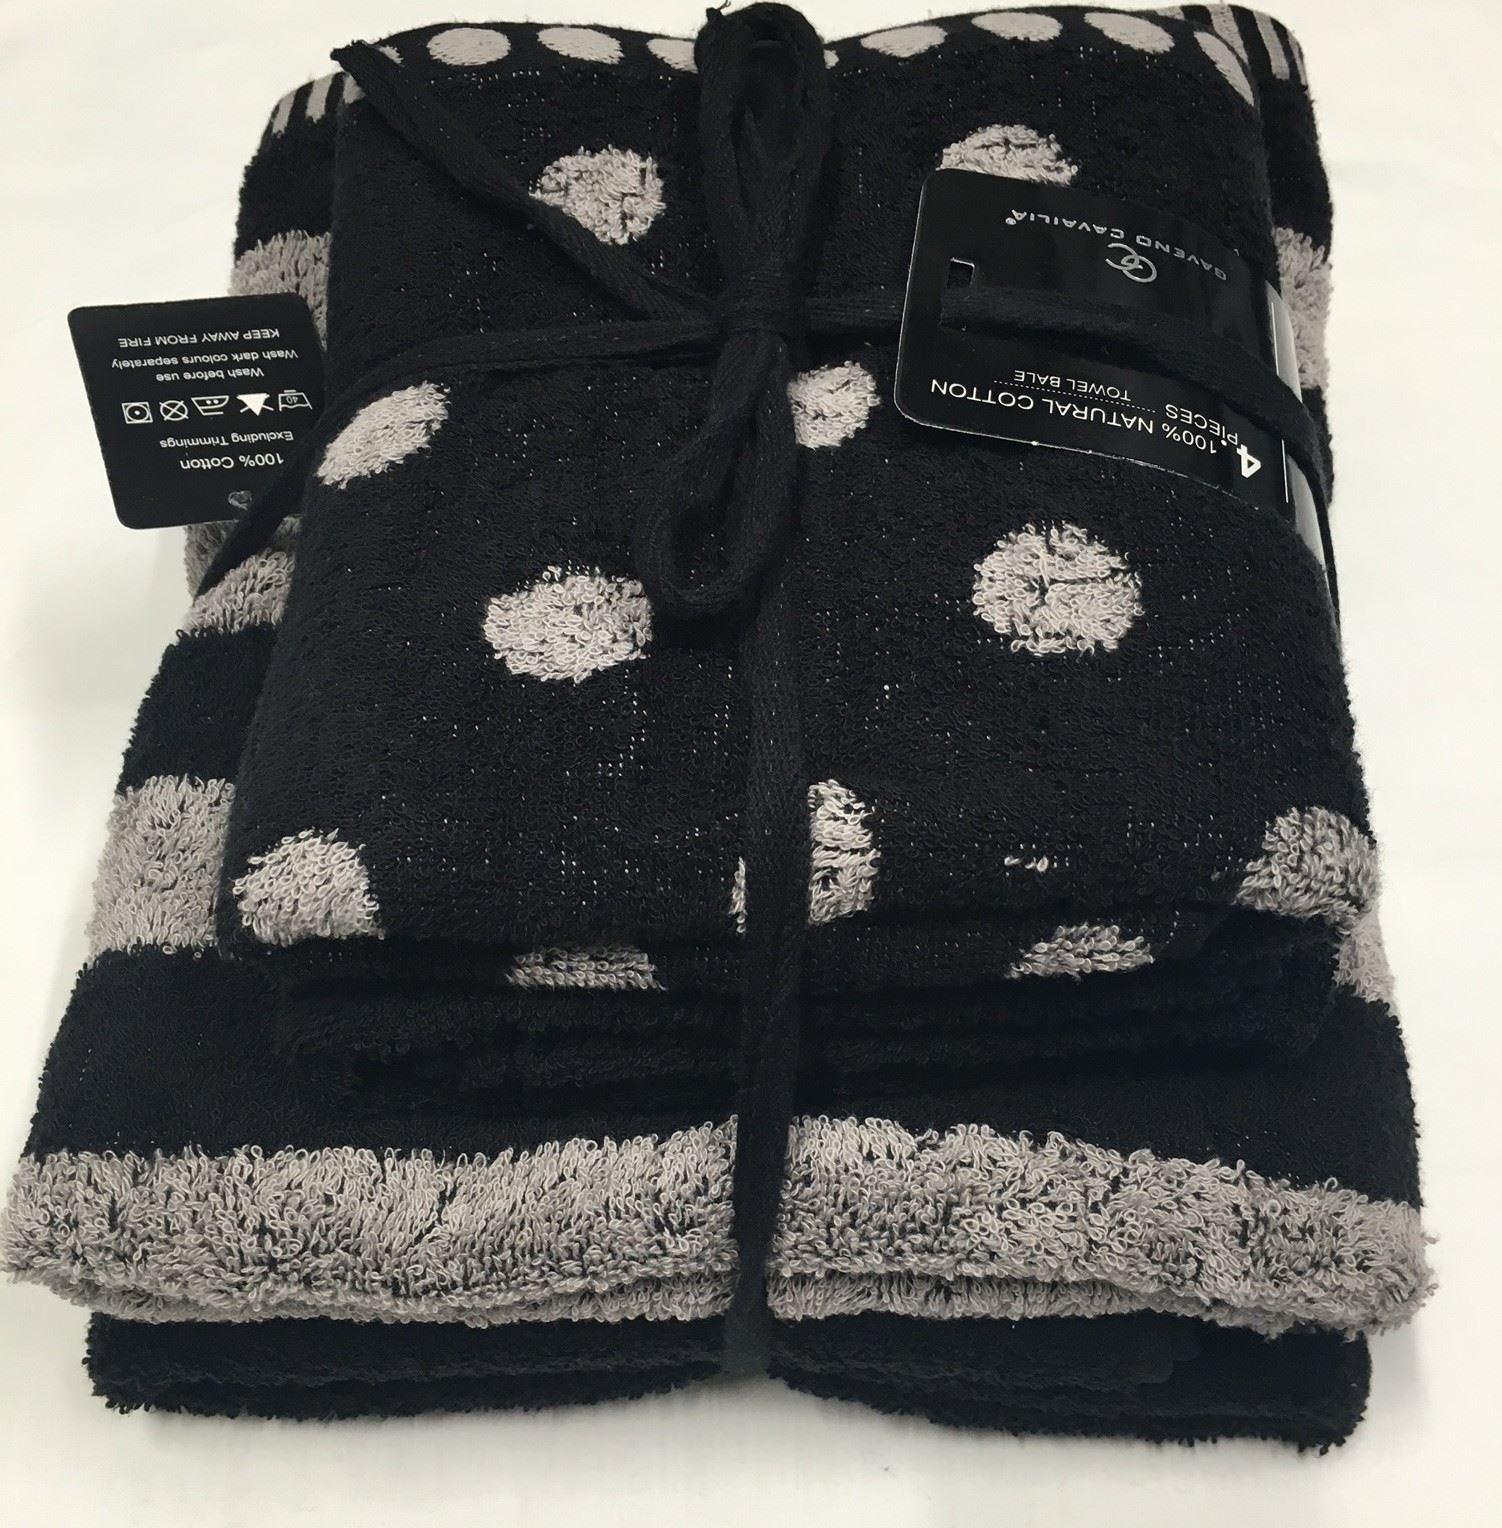 Who Sells Cannon Bath Towels: Polka Dot & Stripe 4 Pcs Bale Set Hand Towel Bath Towel